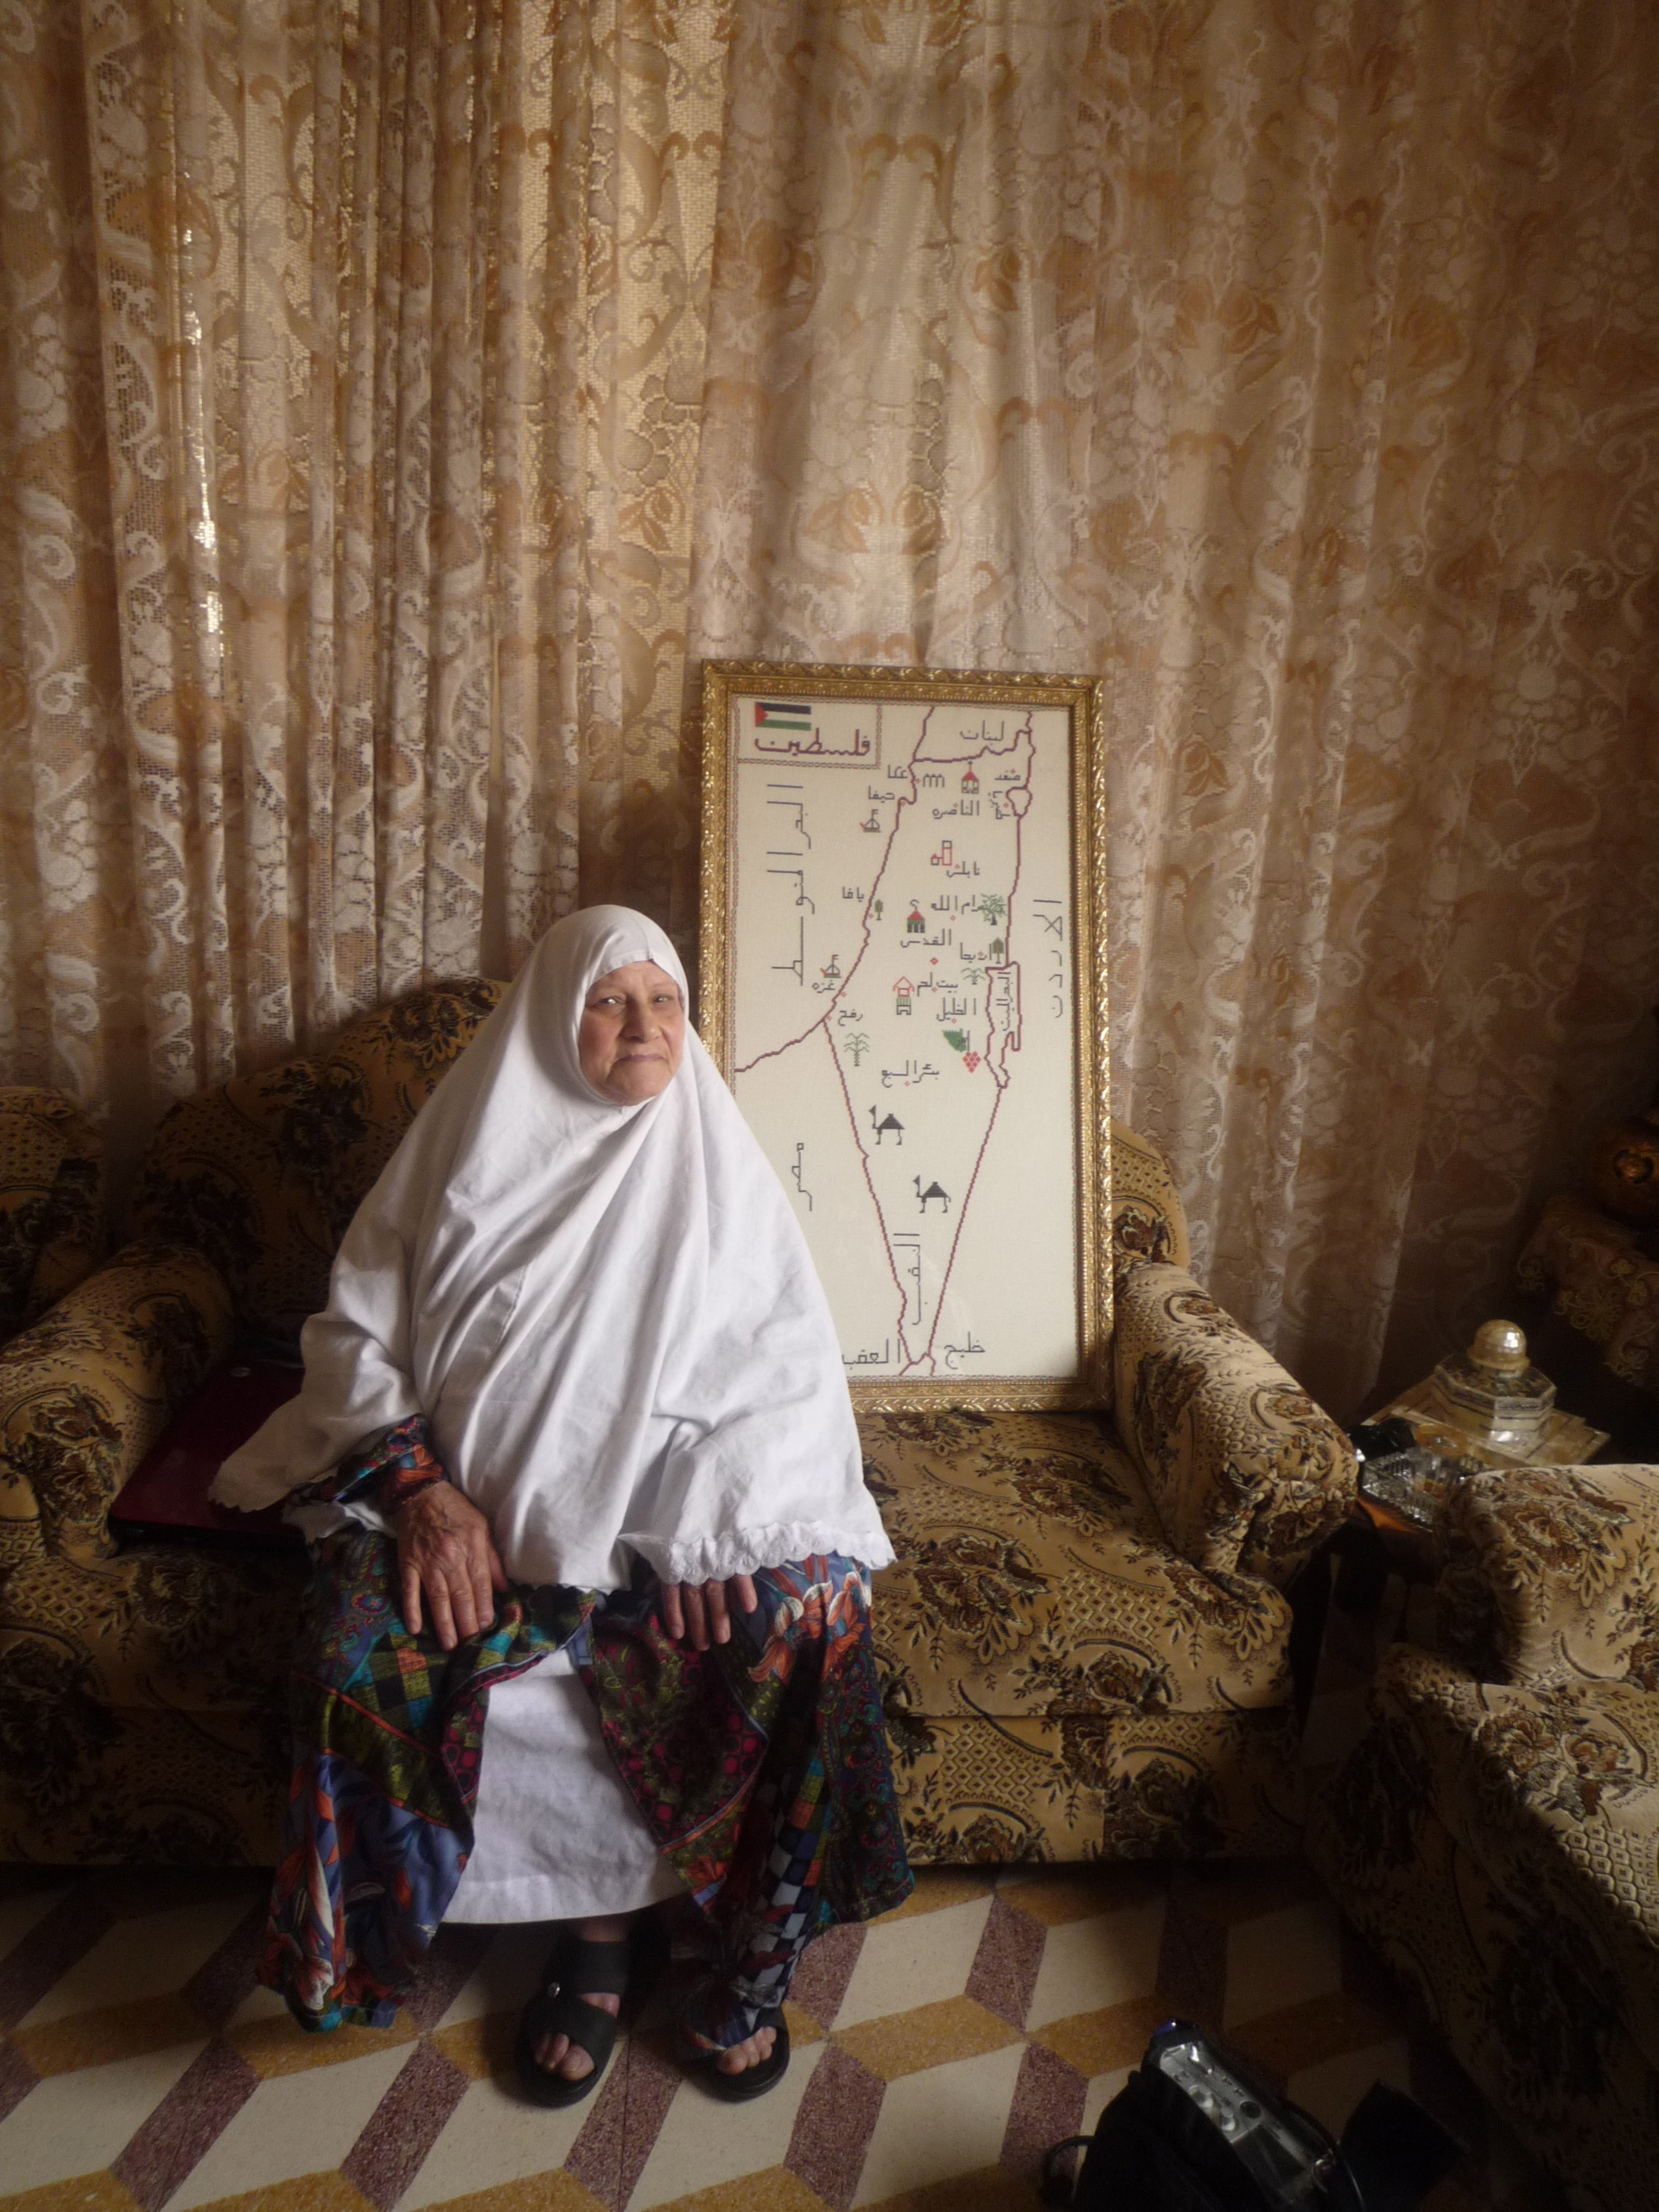 Zakkyeh dans sa maison à Naplouse, Cisjordanie, mai 2013 www.merblanche.com all rights reserved